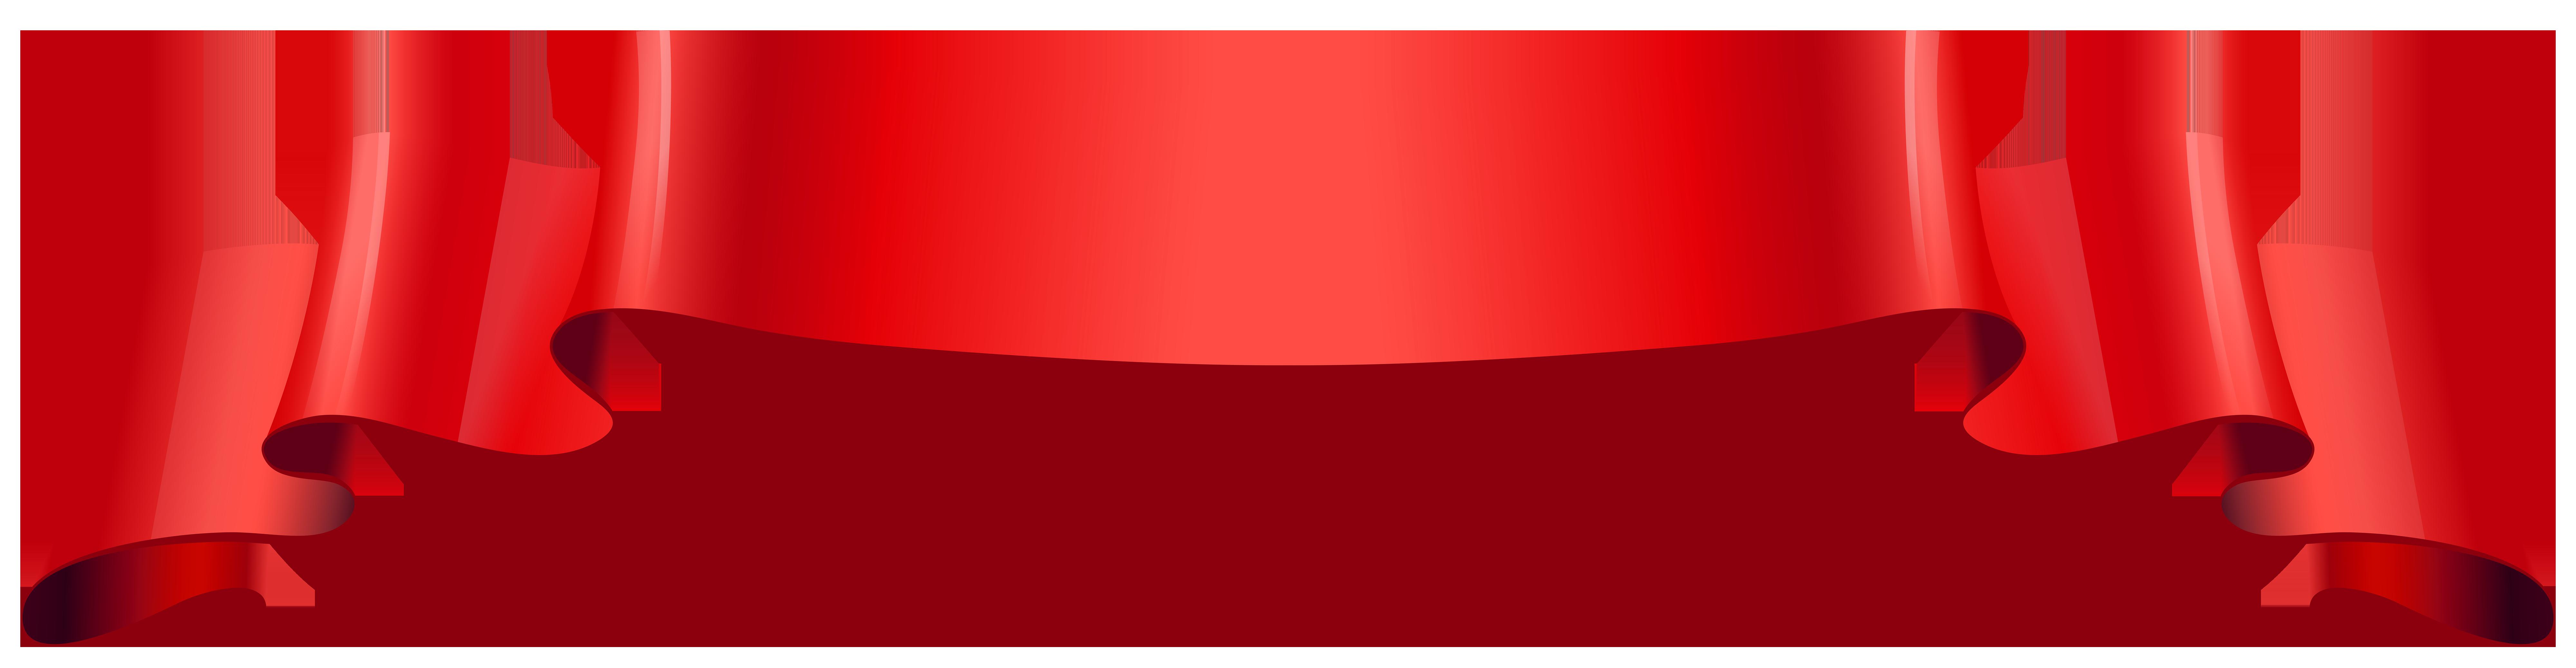 Clipart restaurant banner. Red transparent png image